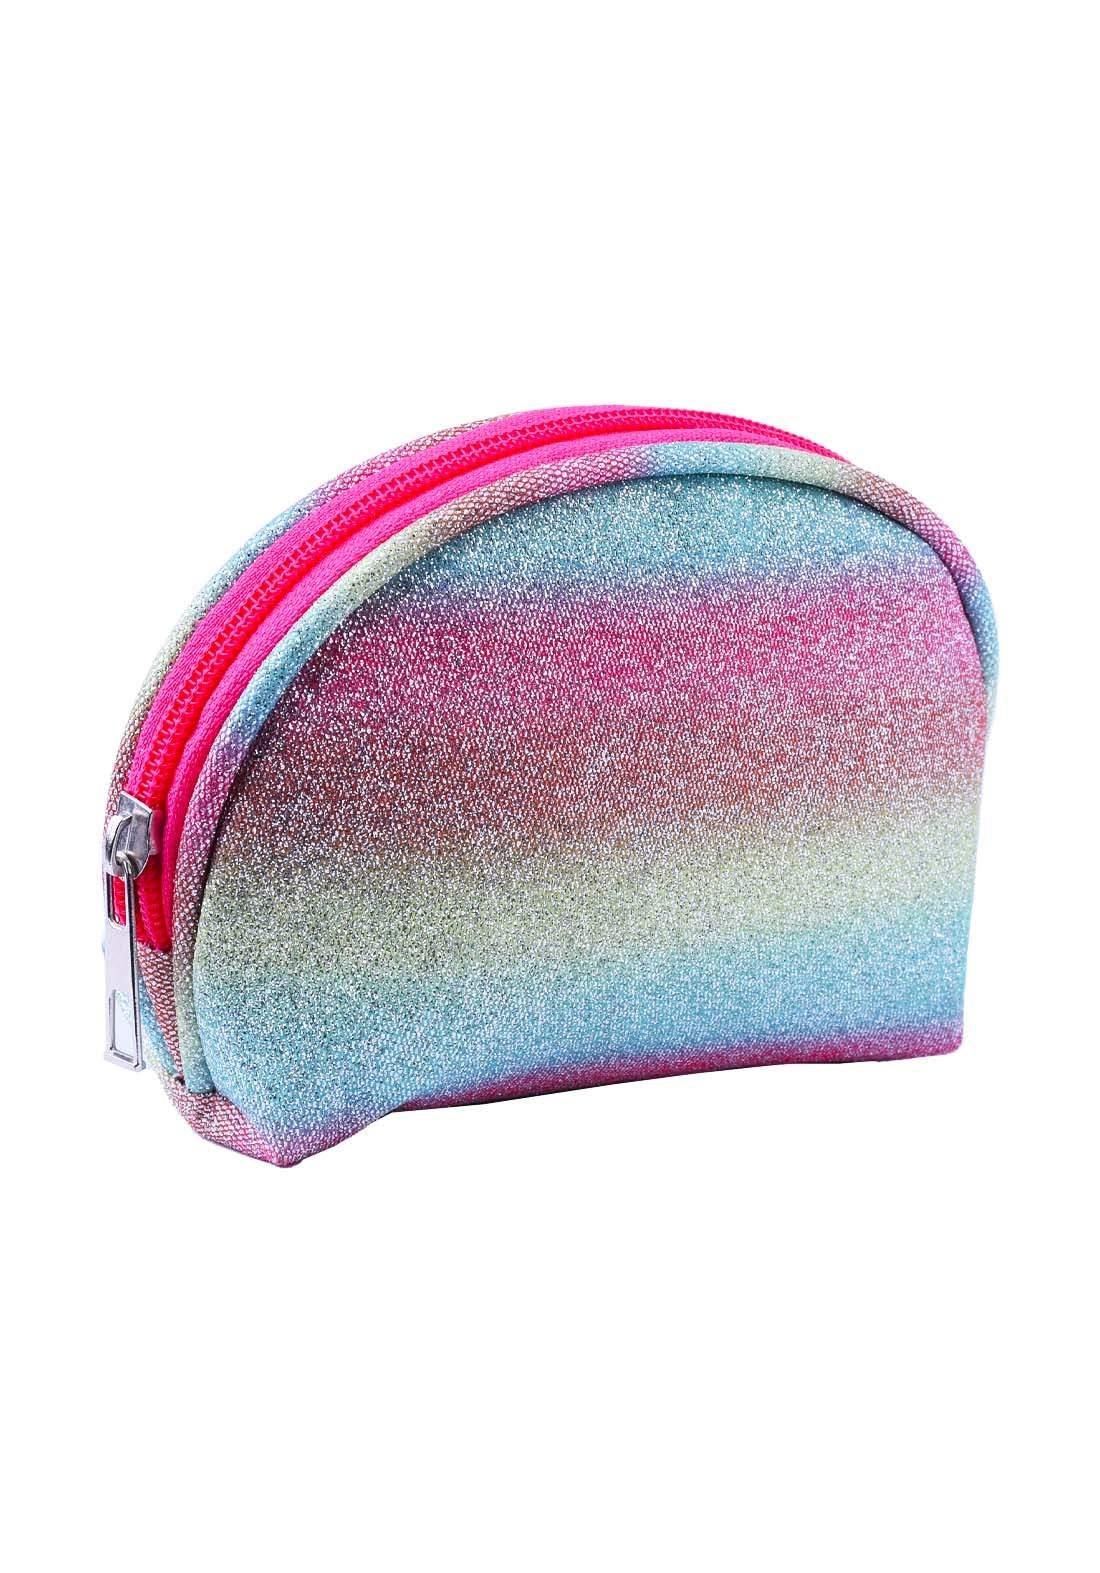 Makeup Bag حقيبة مكياج